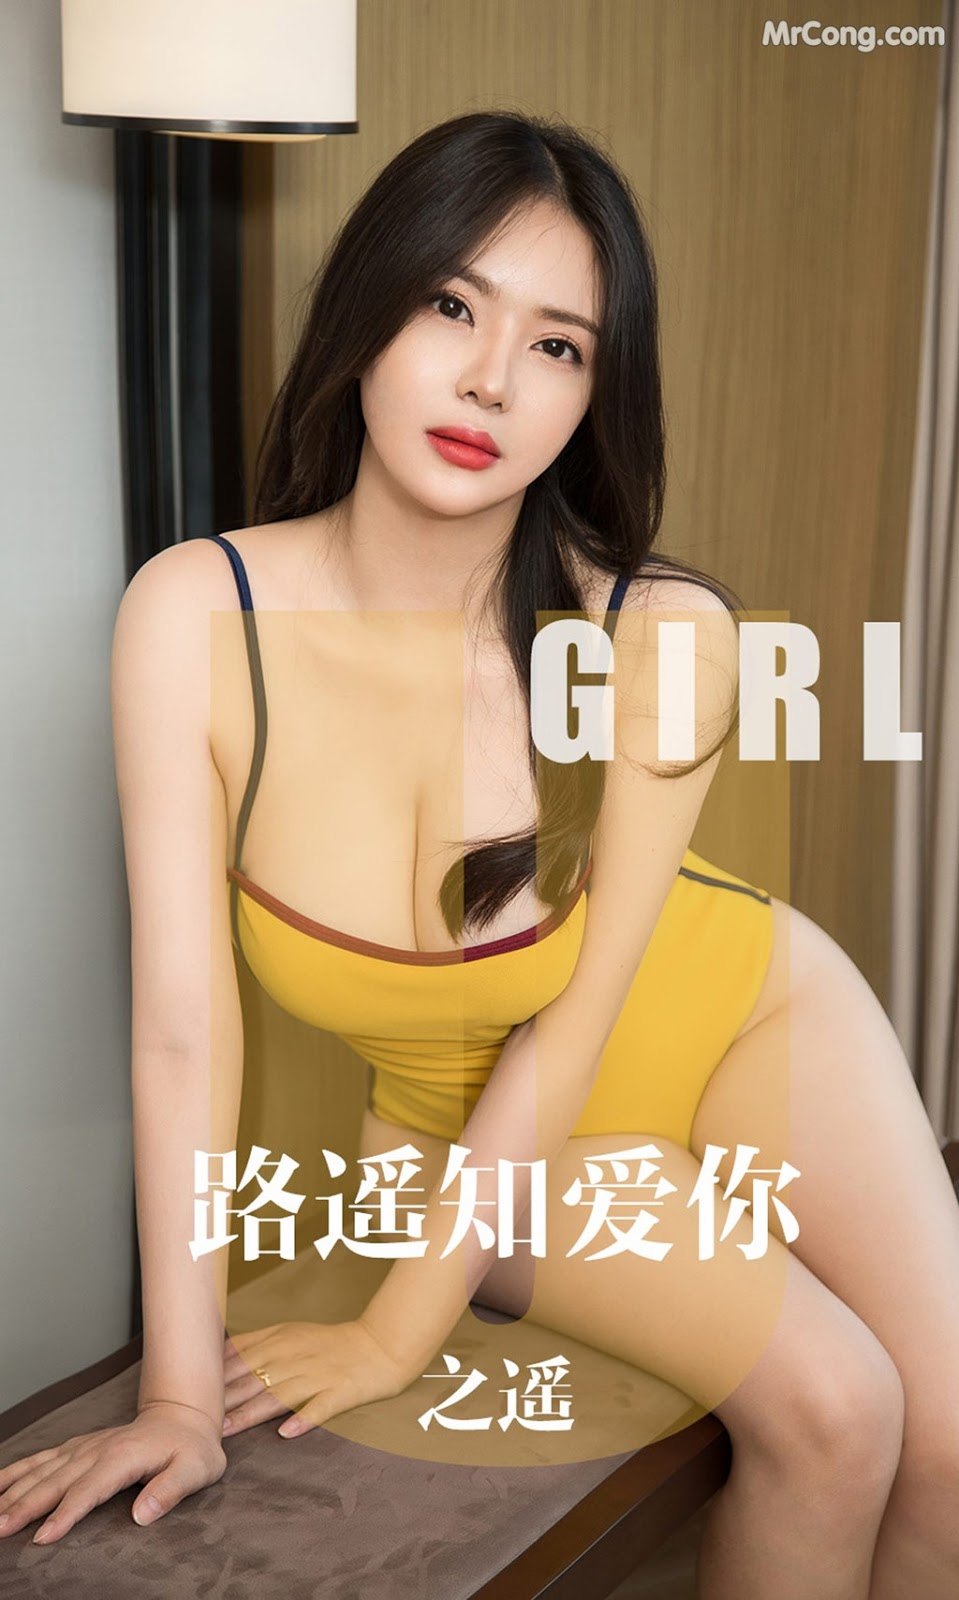 Image UGIRLS-Ai-You-Wu-App-No.1610-MrCong.com-001 in post UGIRLS – Ai You Wu App No.1610: 之遥 (34 ảnh)